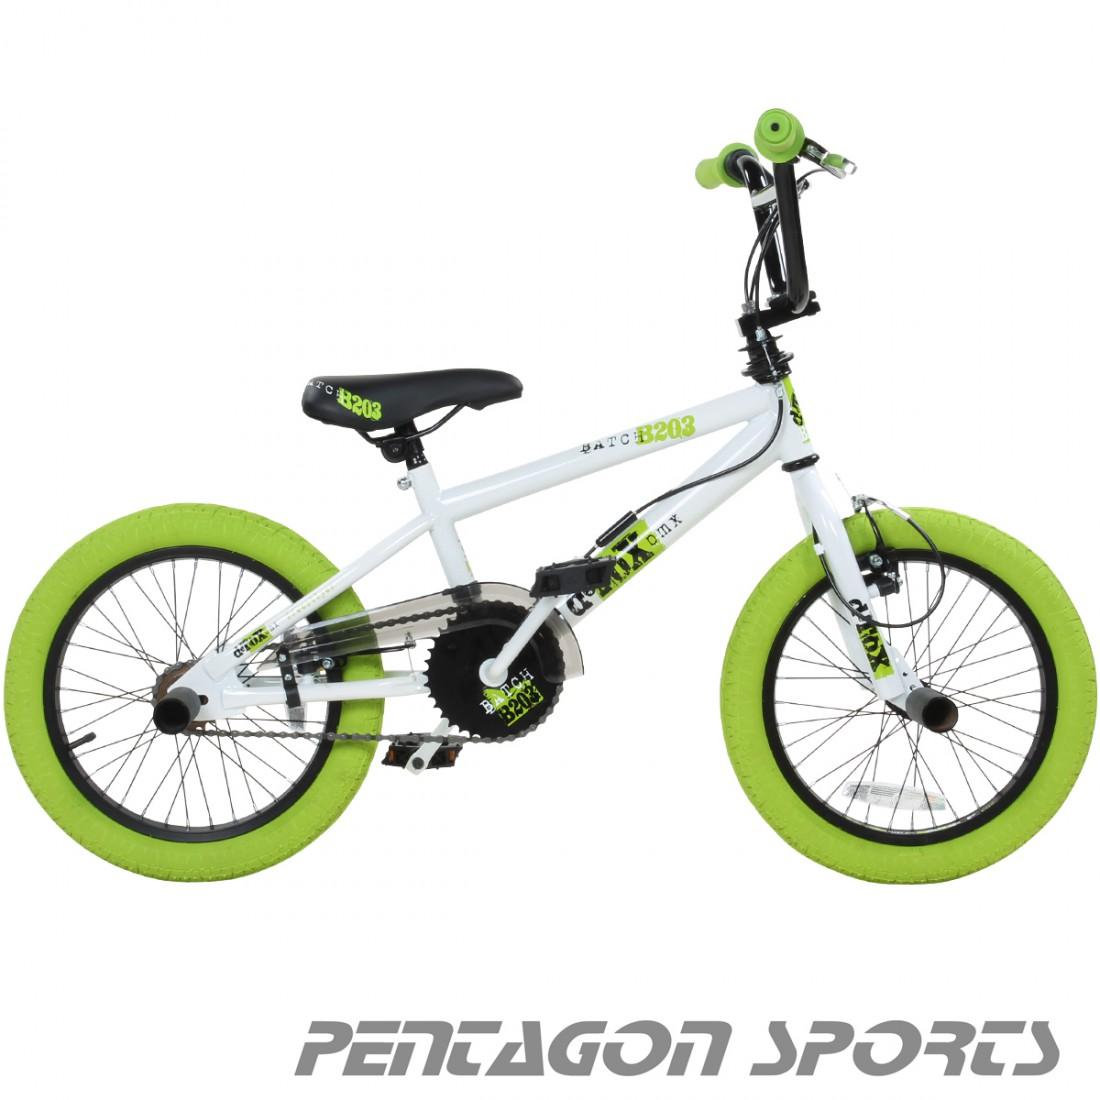 16 pouces bmx d tox bike velo freestyle bicyclette v lo d 39 enfants enfants jeunes ebay. Black Bedroom Furniture Sets. Home Design Ideas